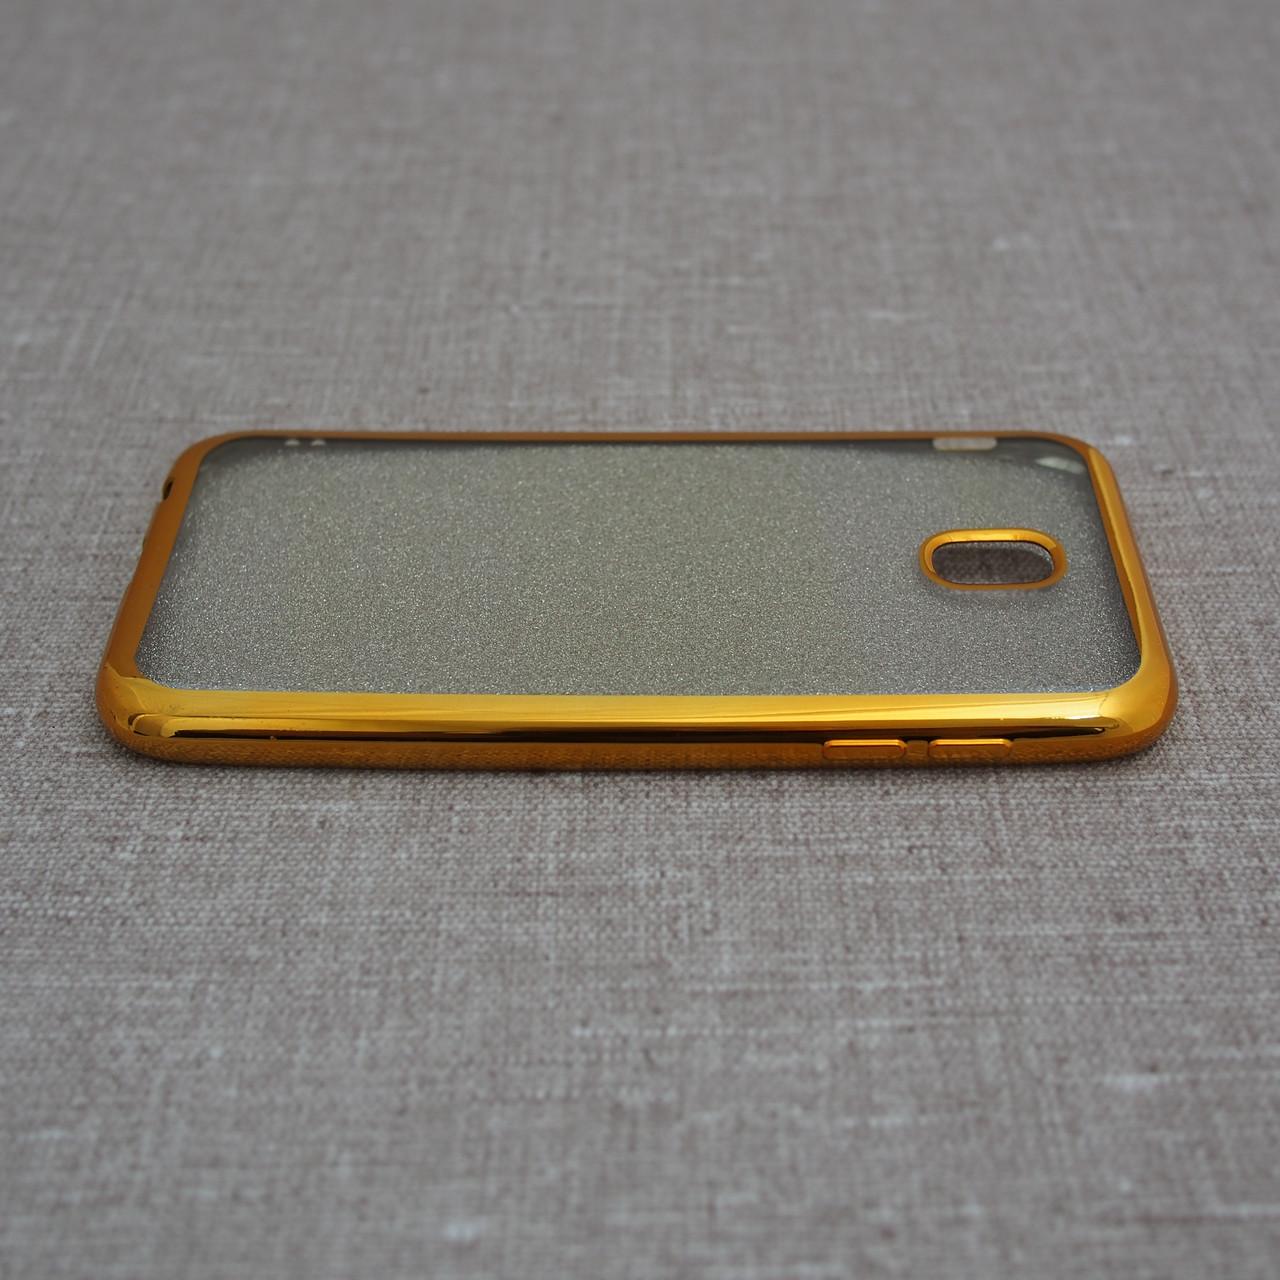 Чехлы для Samsung Galaxy J5 (2017) J530F Remax Glitter Air J530 gold (J530) 2017 Для телефона